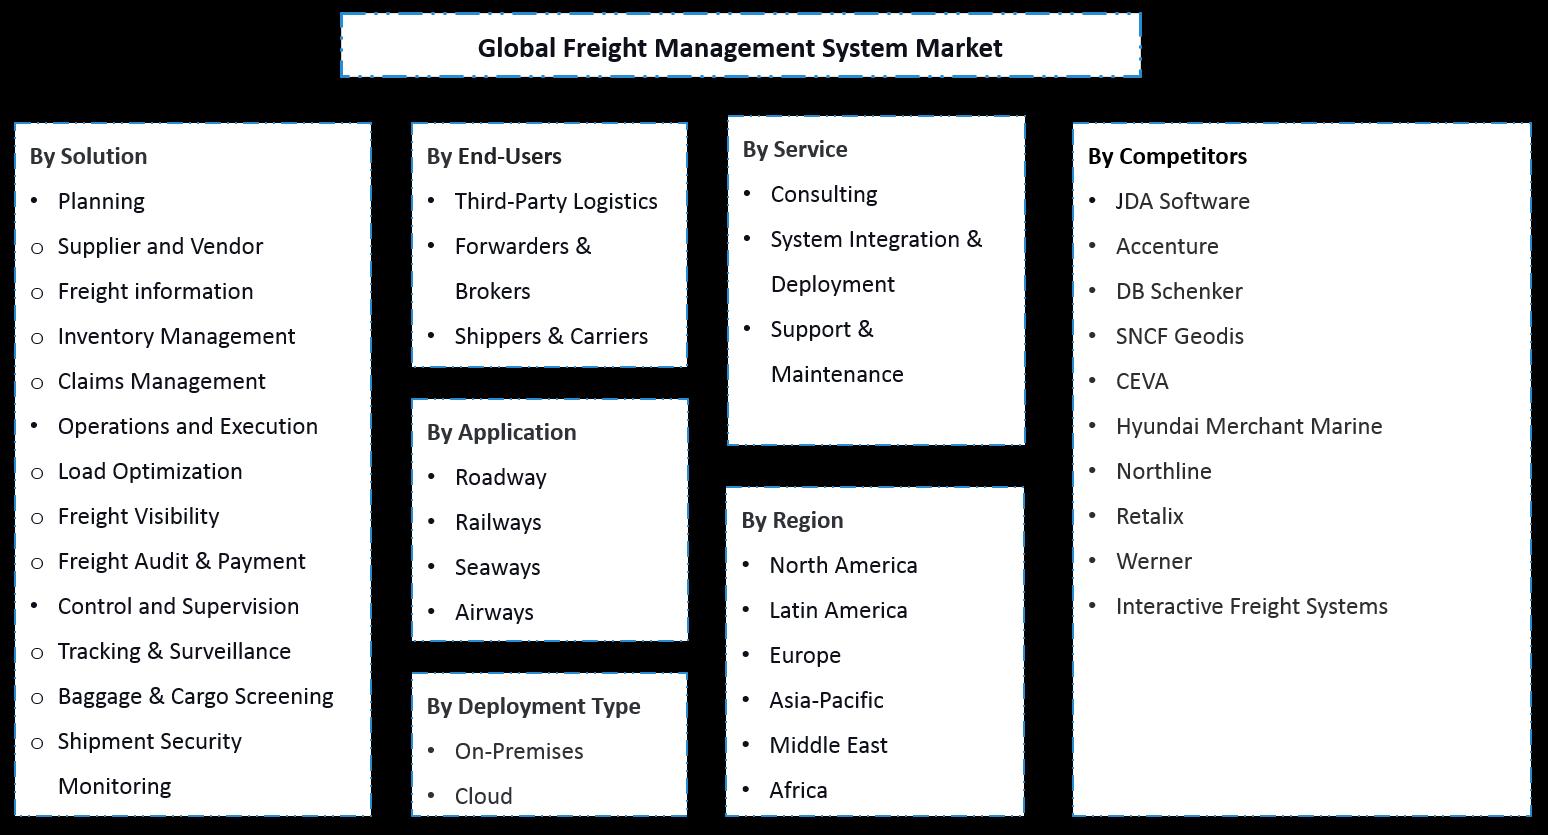 Global Freight Management System Market Segmentation